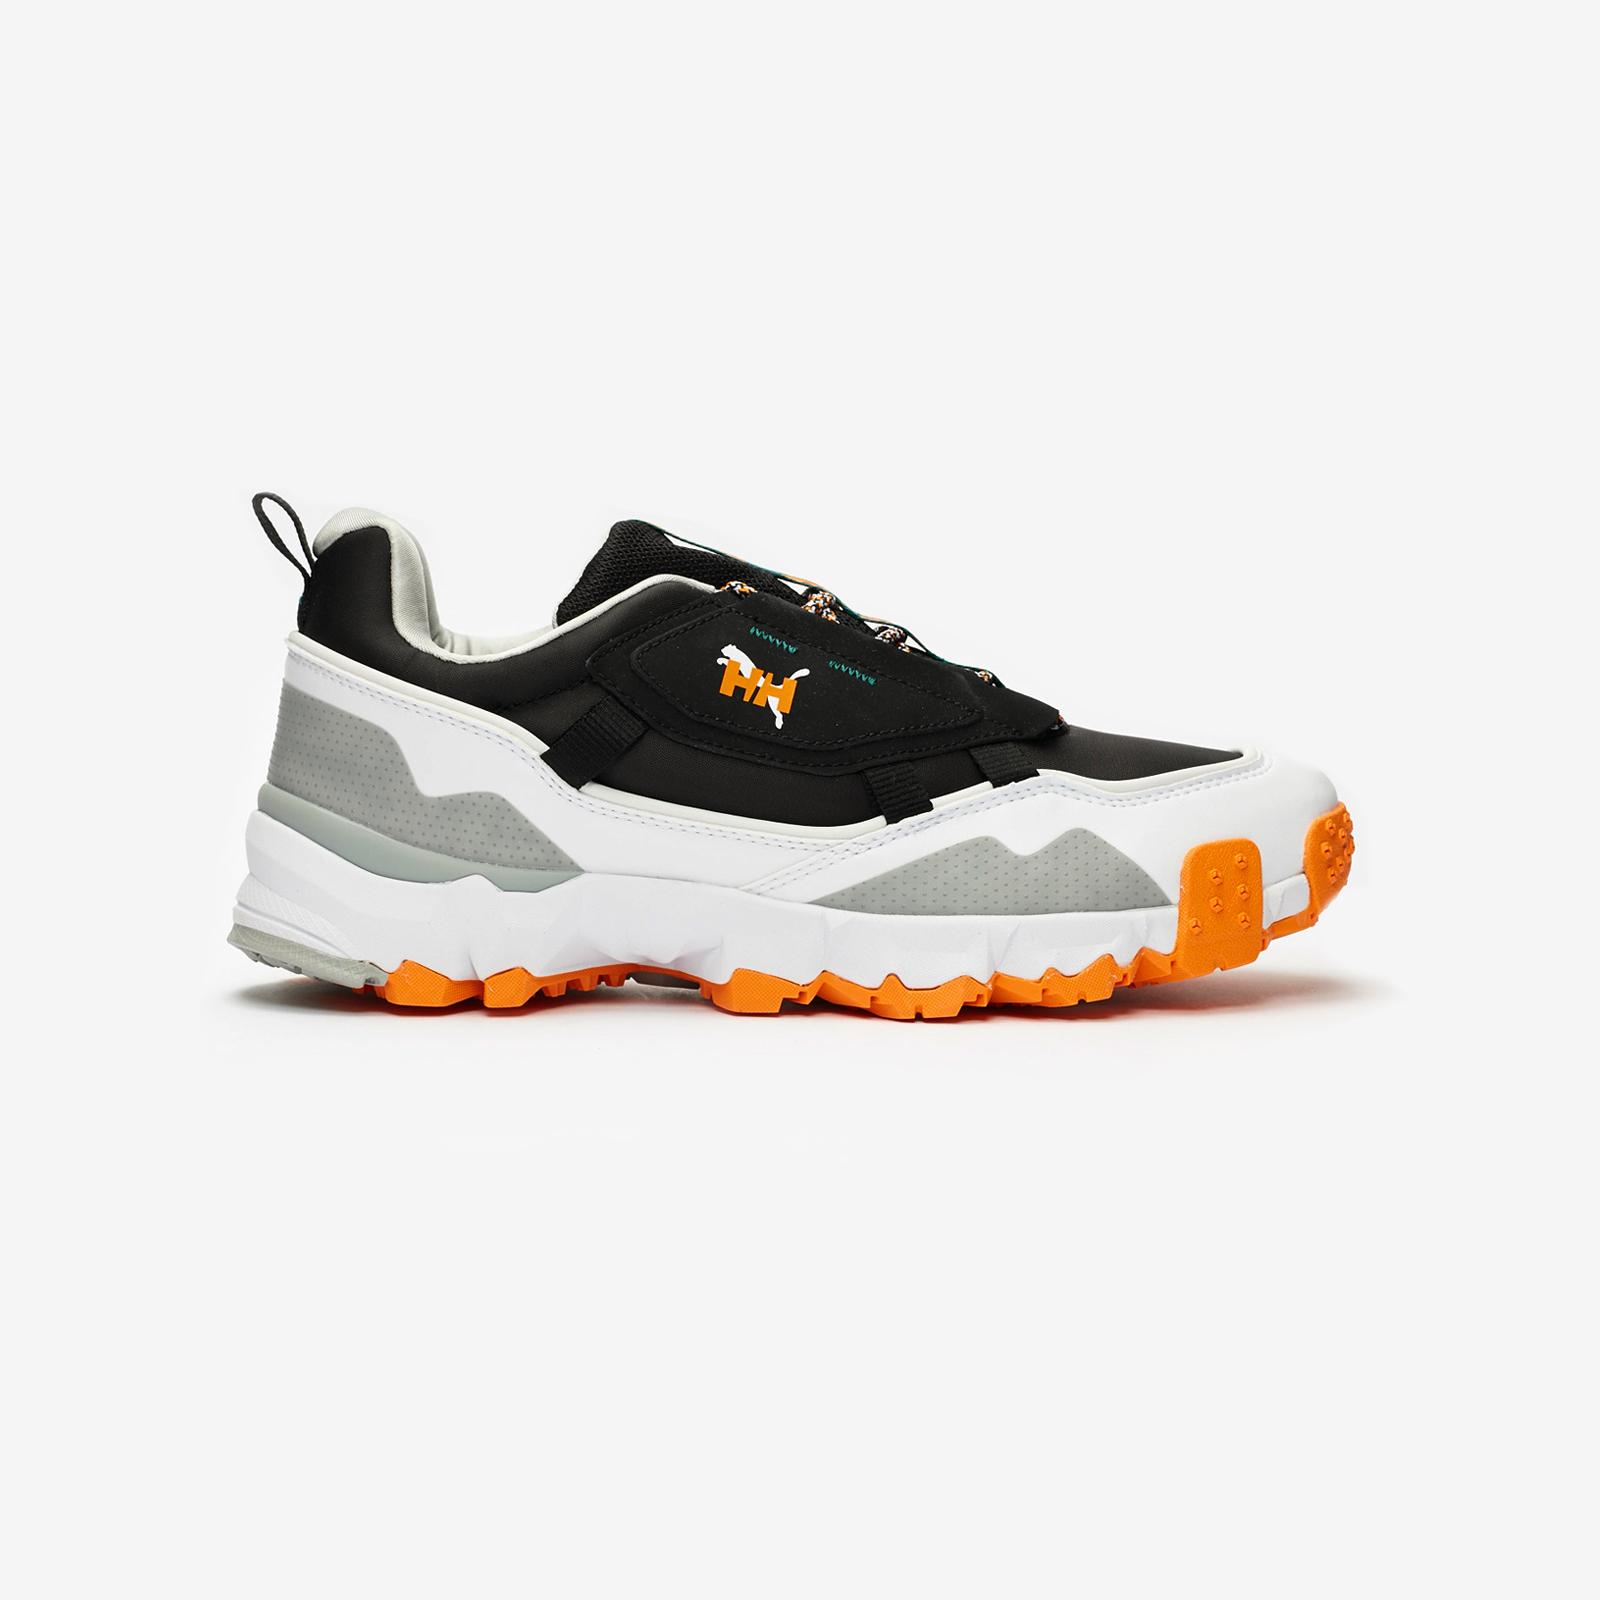 Puma Trailfox x Helly Hansen 372517 01 Sneakersnstuff